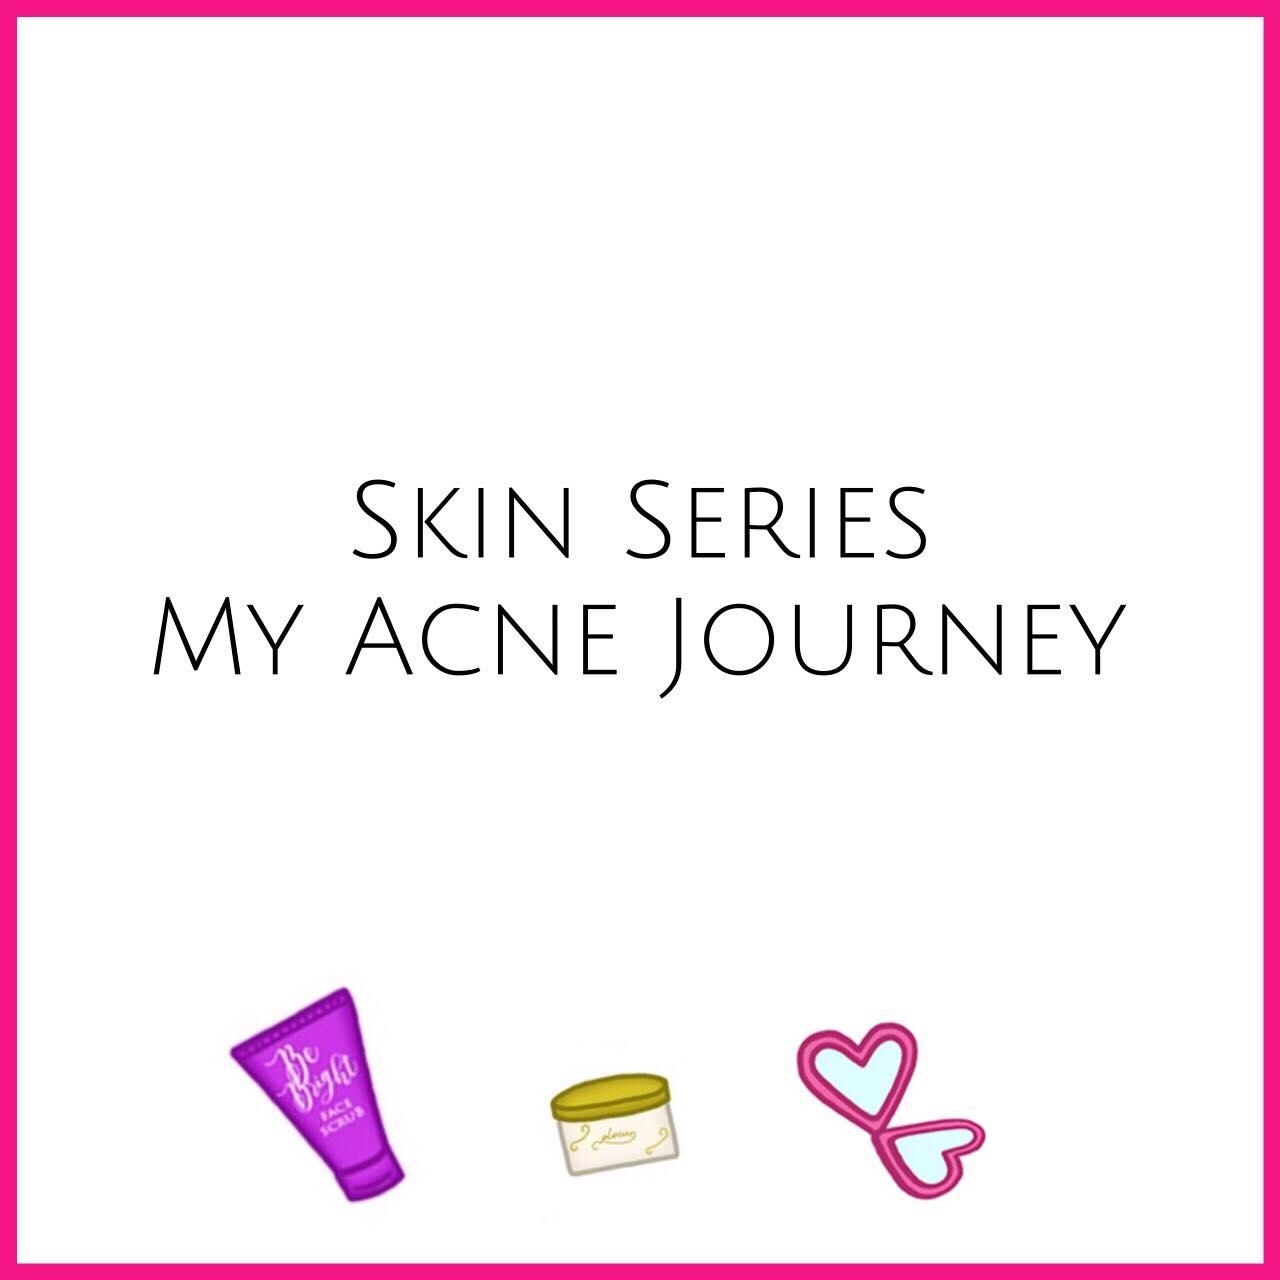 Skin Series My Acne Journey